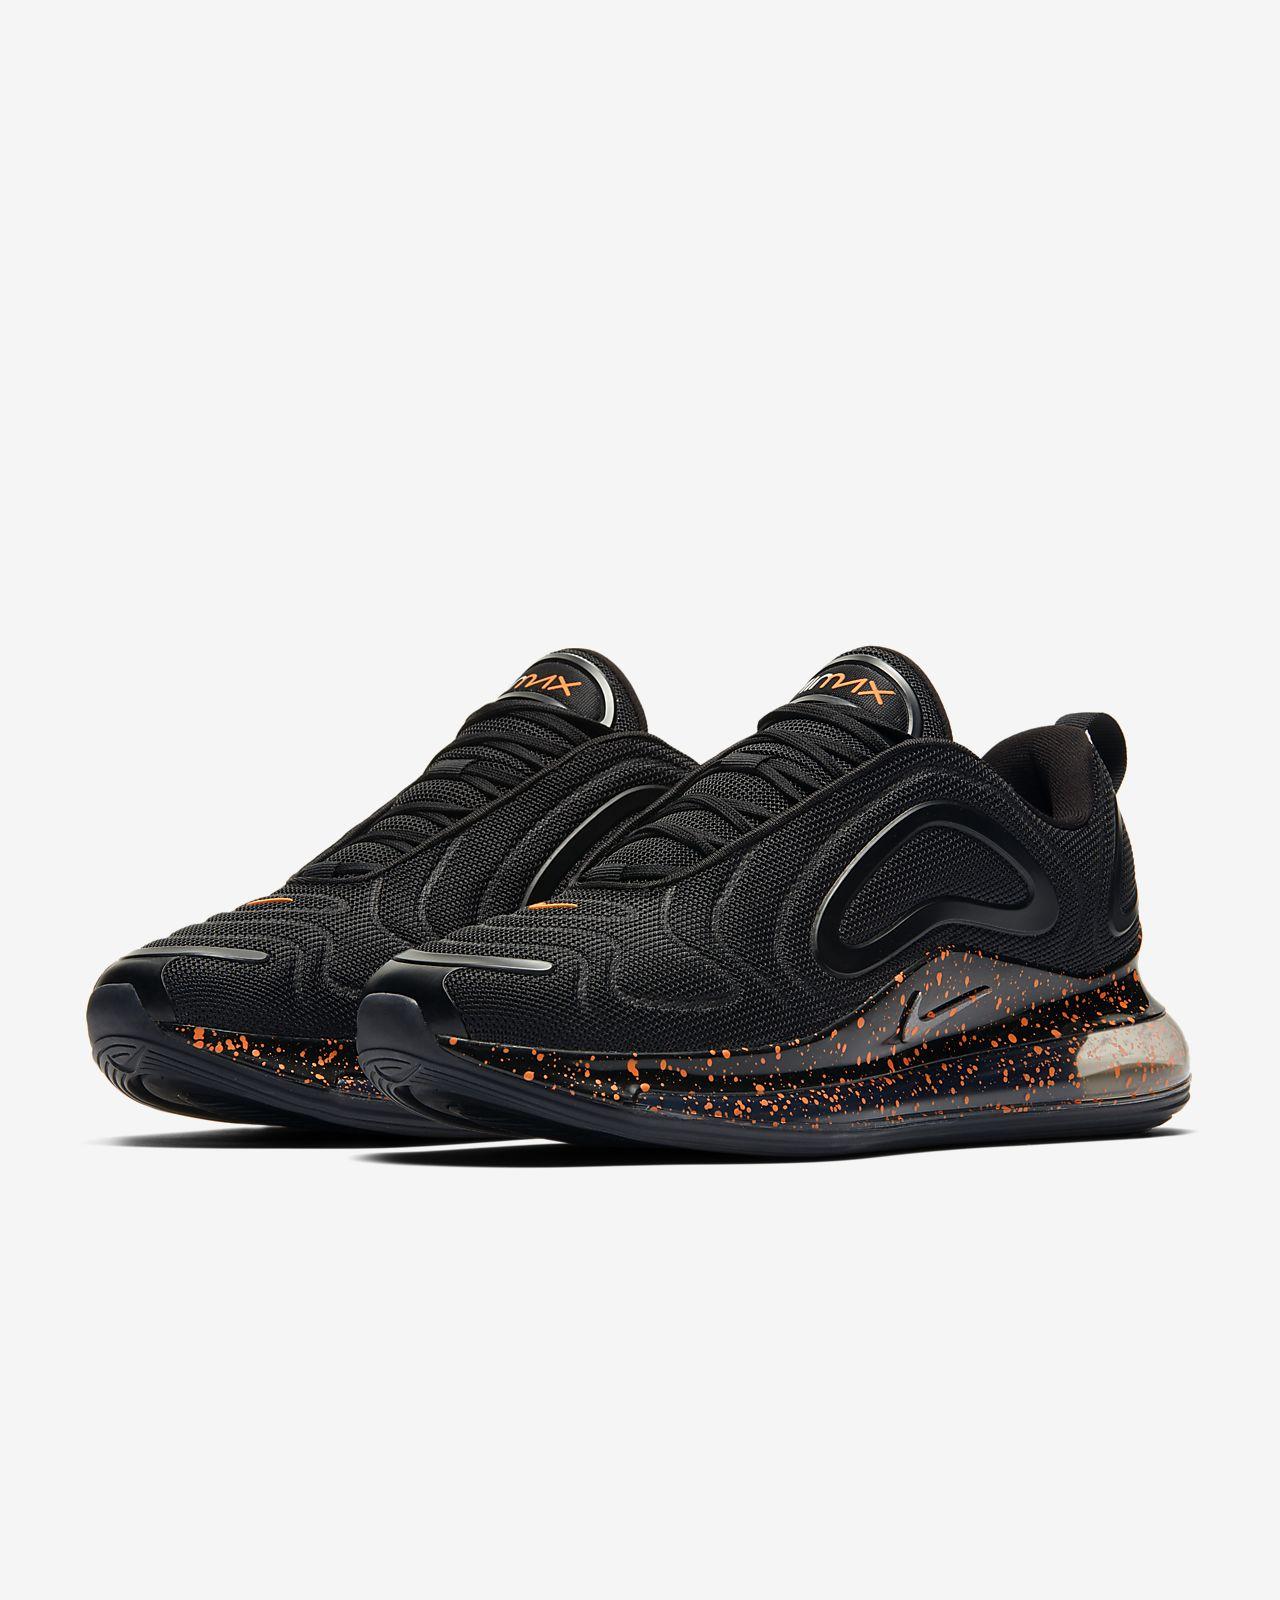 Chaussure Nike Air Max 720 pour Homme. FR